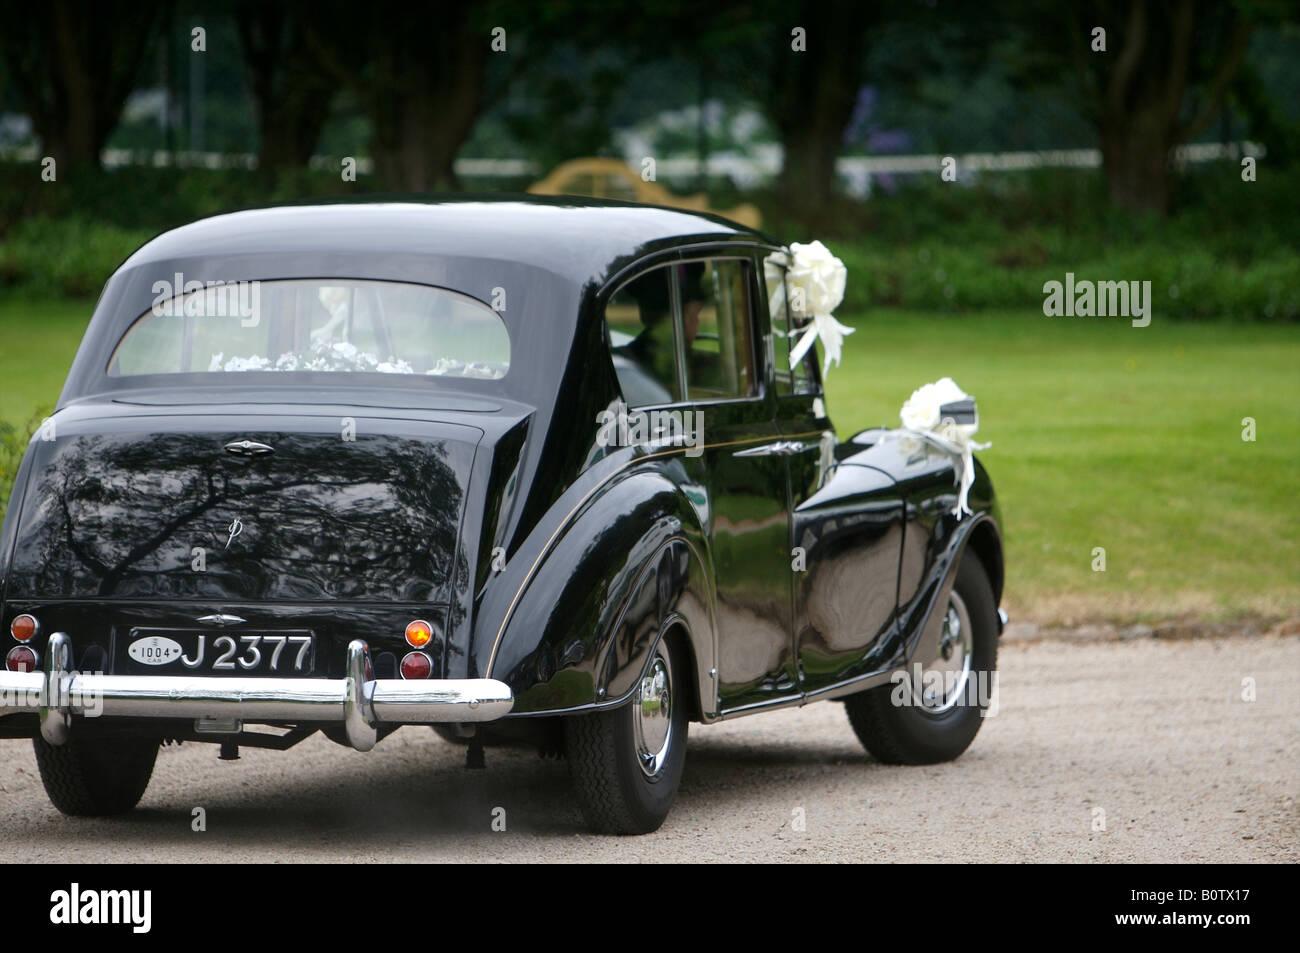 Vintage Wedding Car Stock Photos & Vintage Wedding Car Stock Images ...